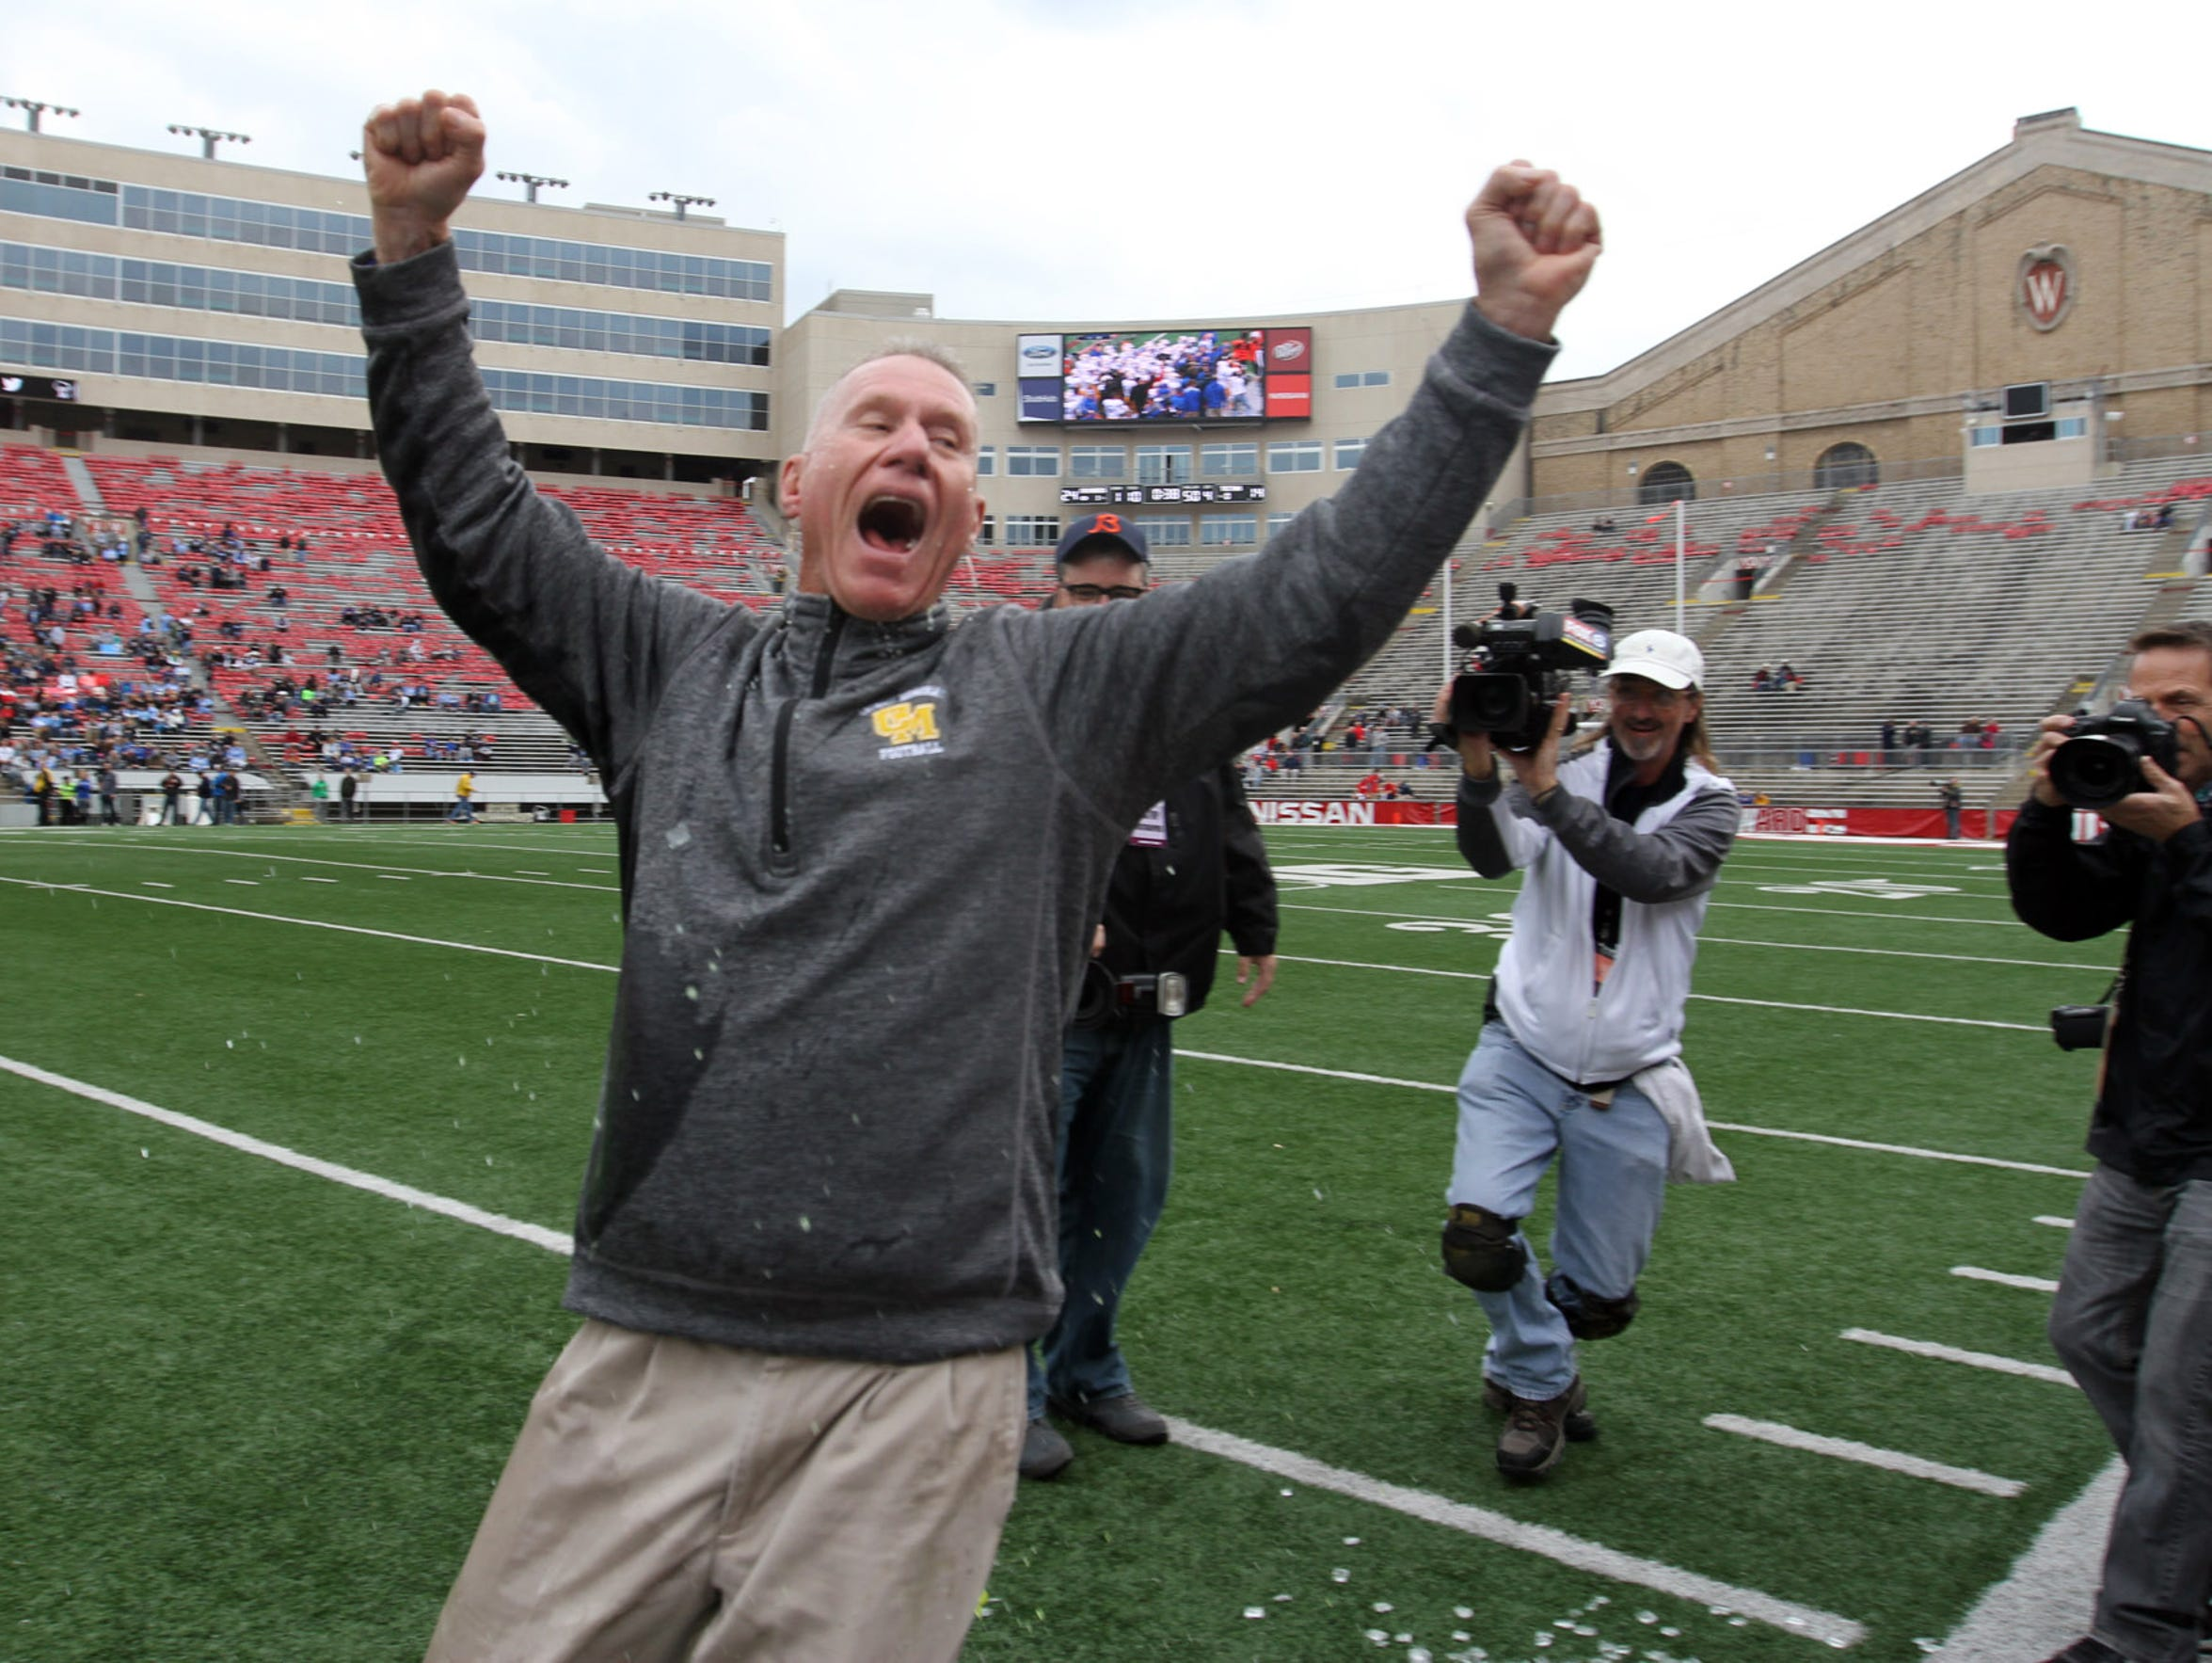 Catholic Memorial head coach Bill Young celebrates